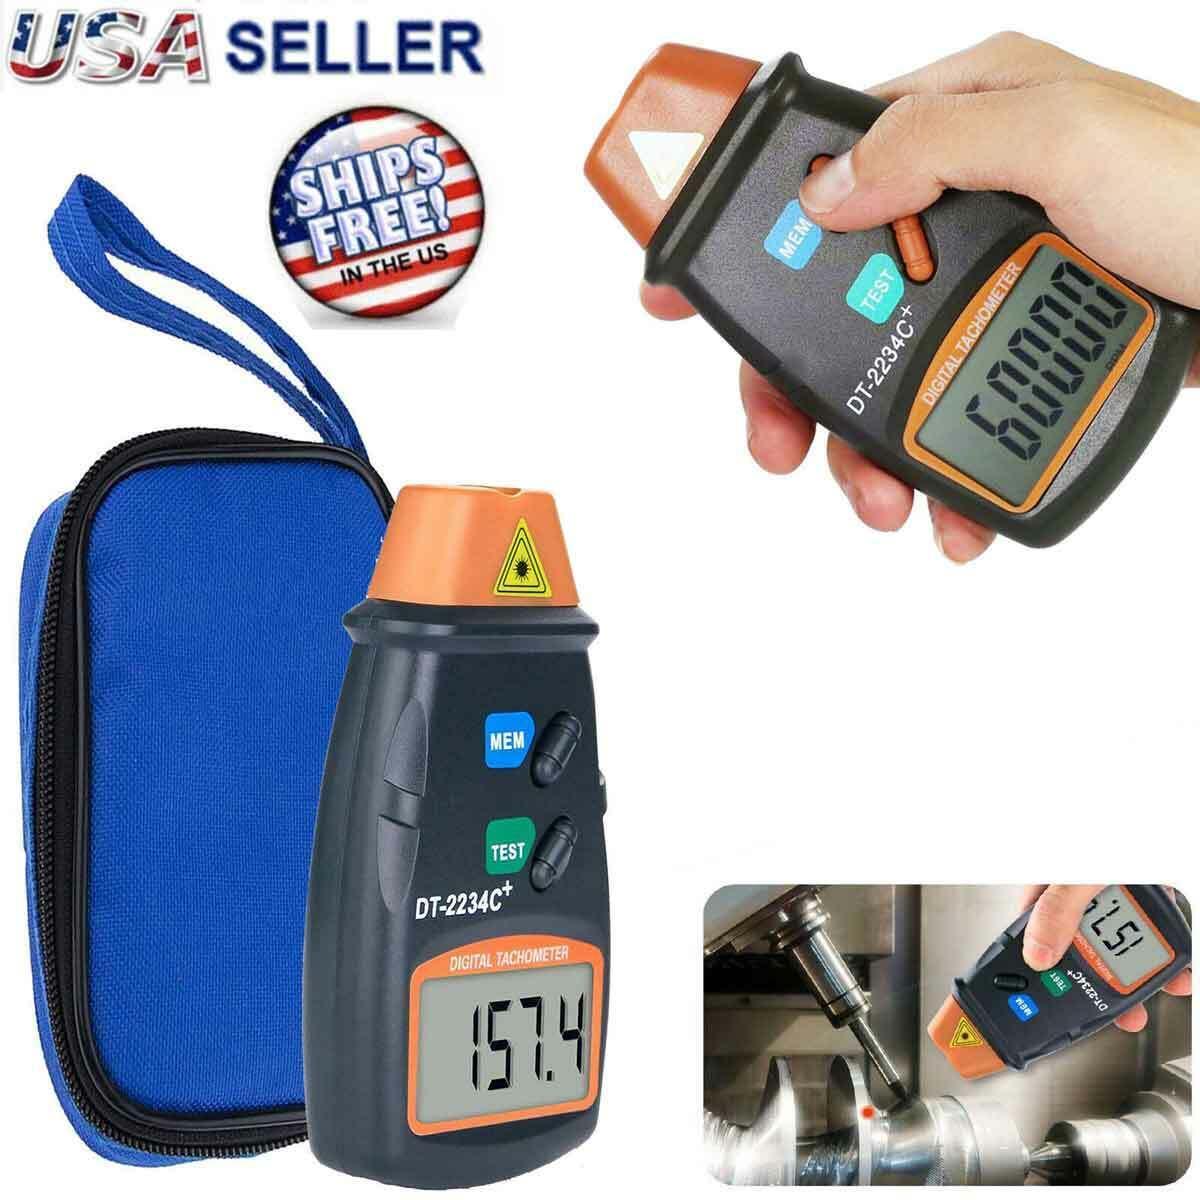 Digital Tachometer Non Contact Laser Photo RPM Tach Meter Motor Speed Gauge New Business & Industrial